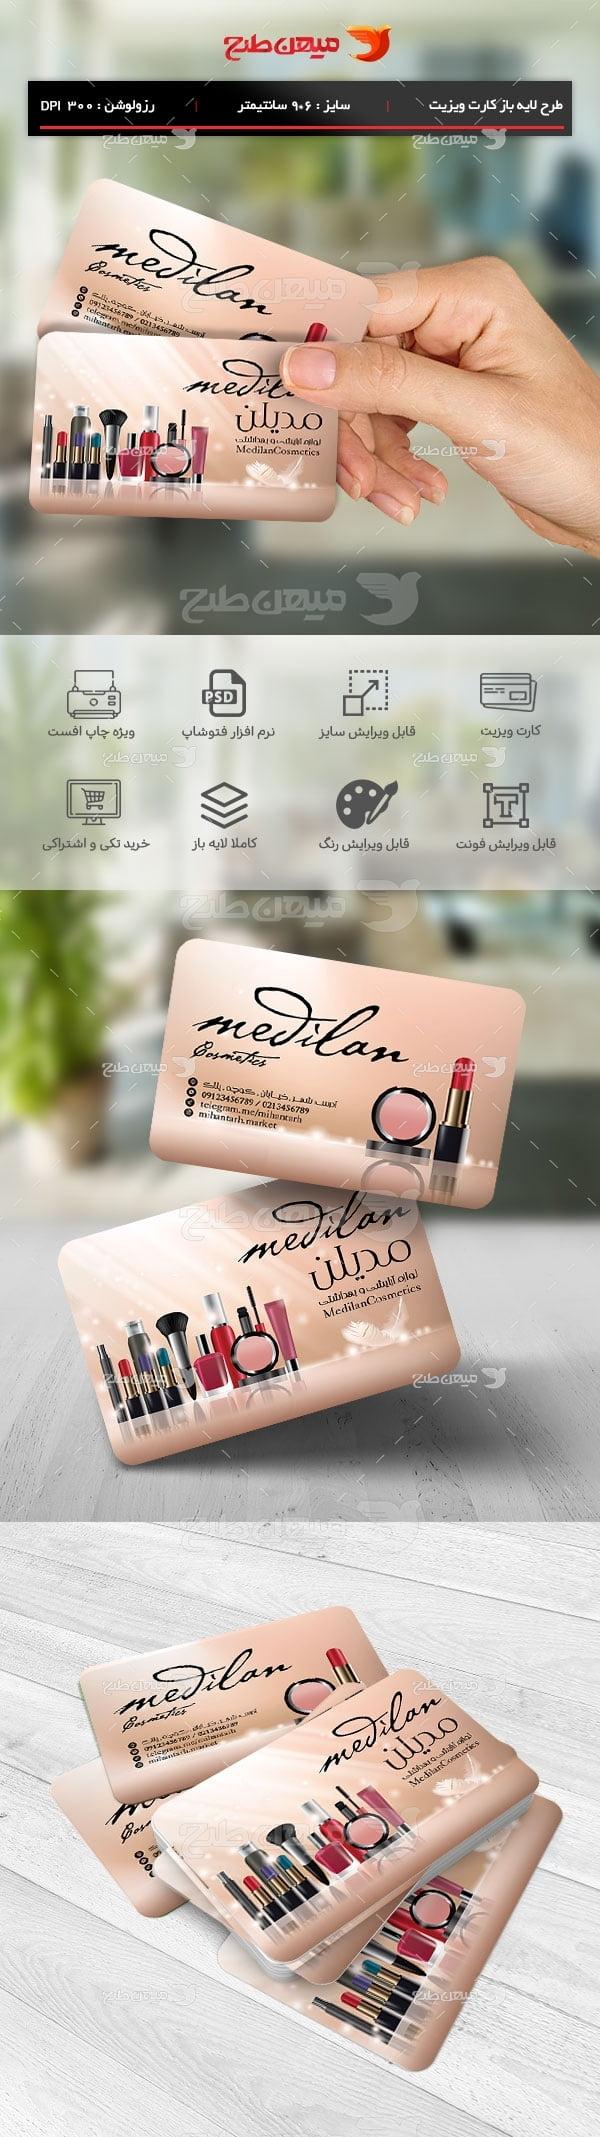 طرح لایه باز کارت ویزیت لوازم آرایشی و بهداشتی